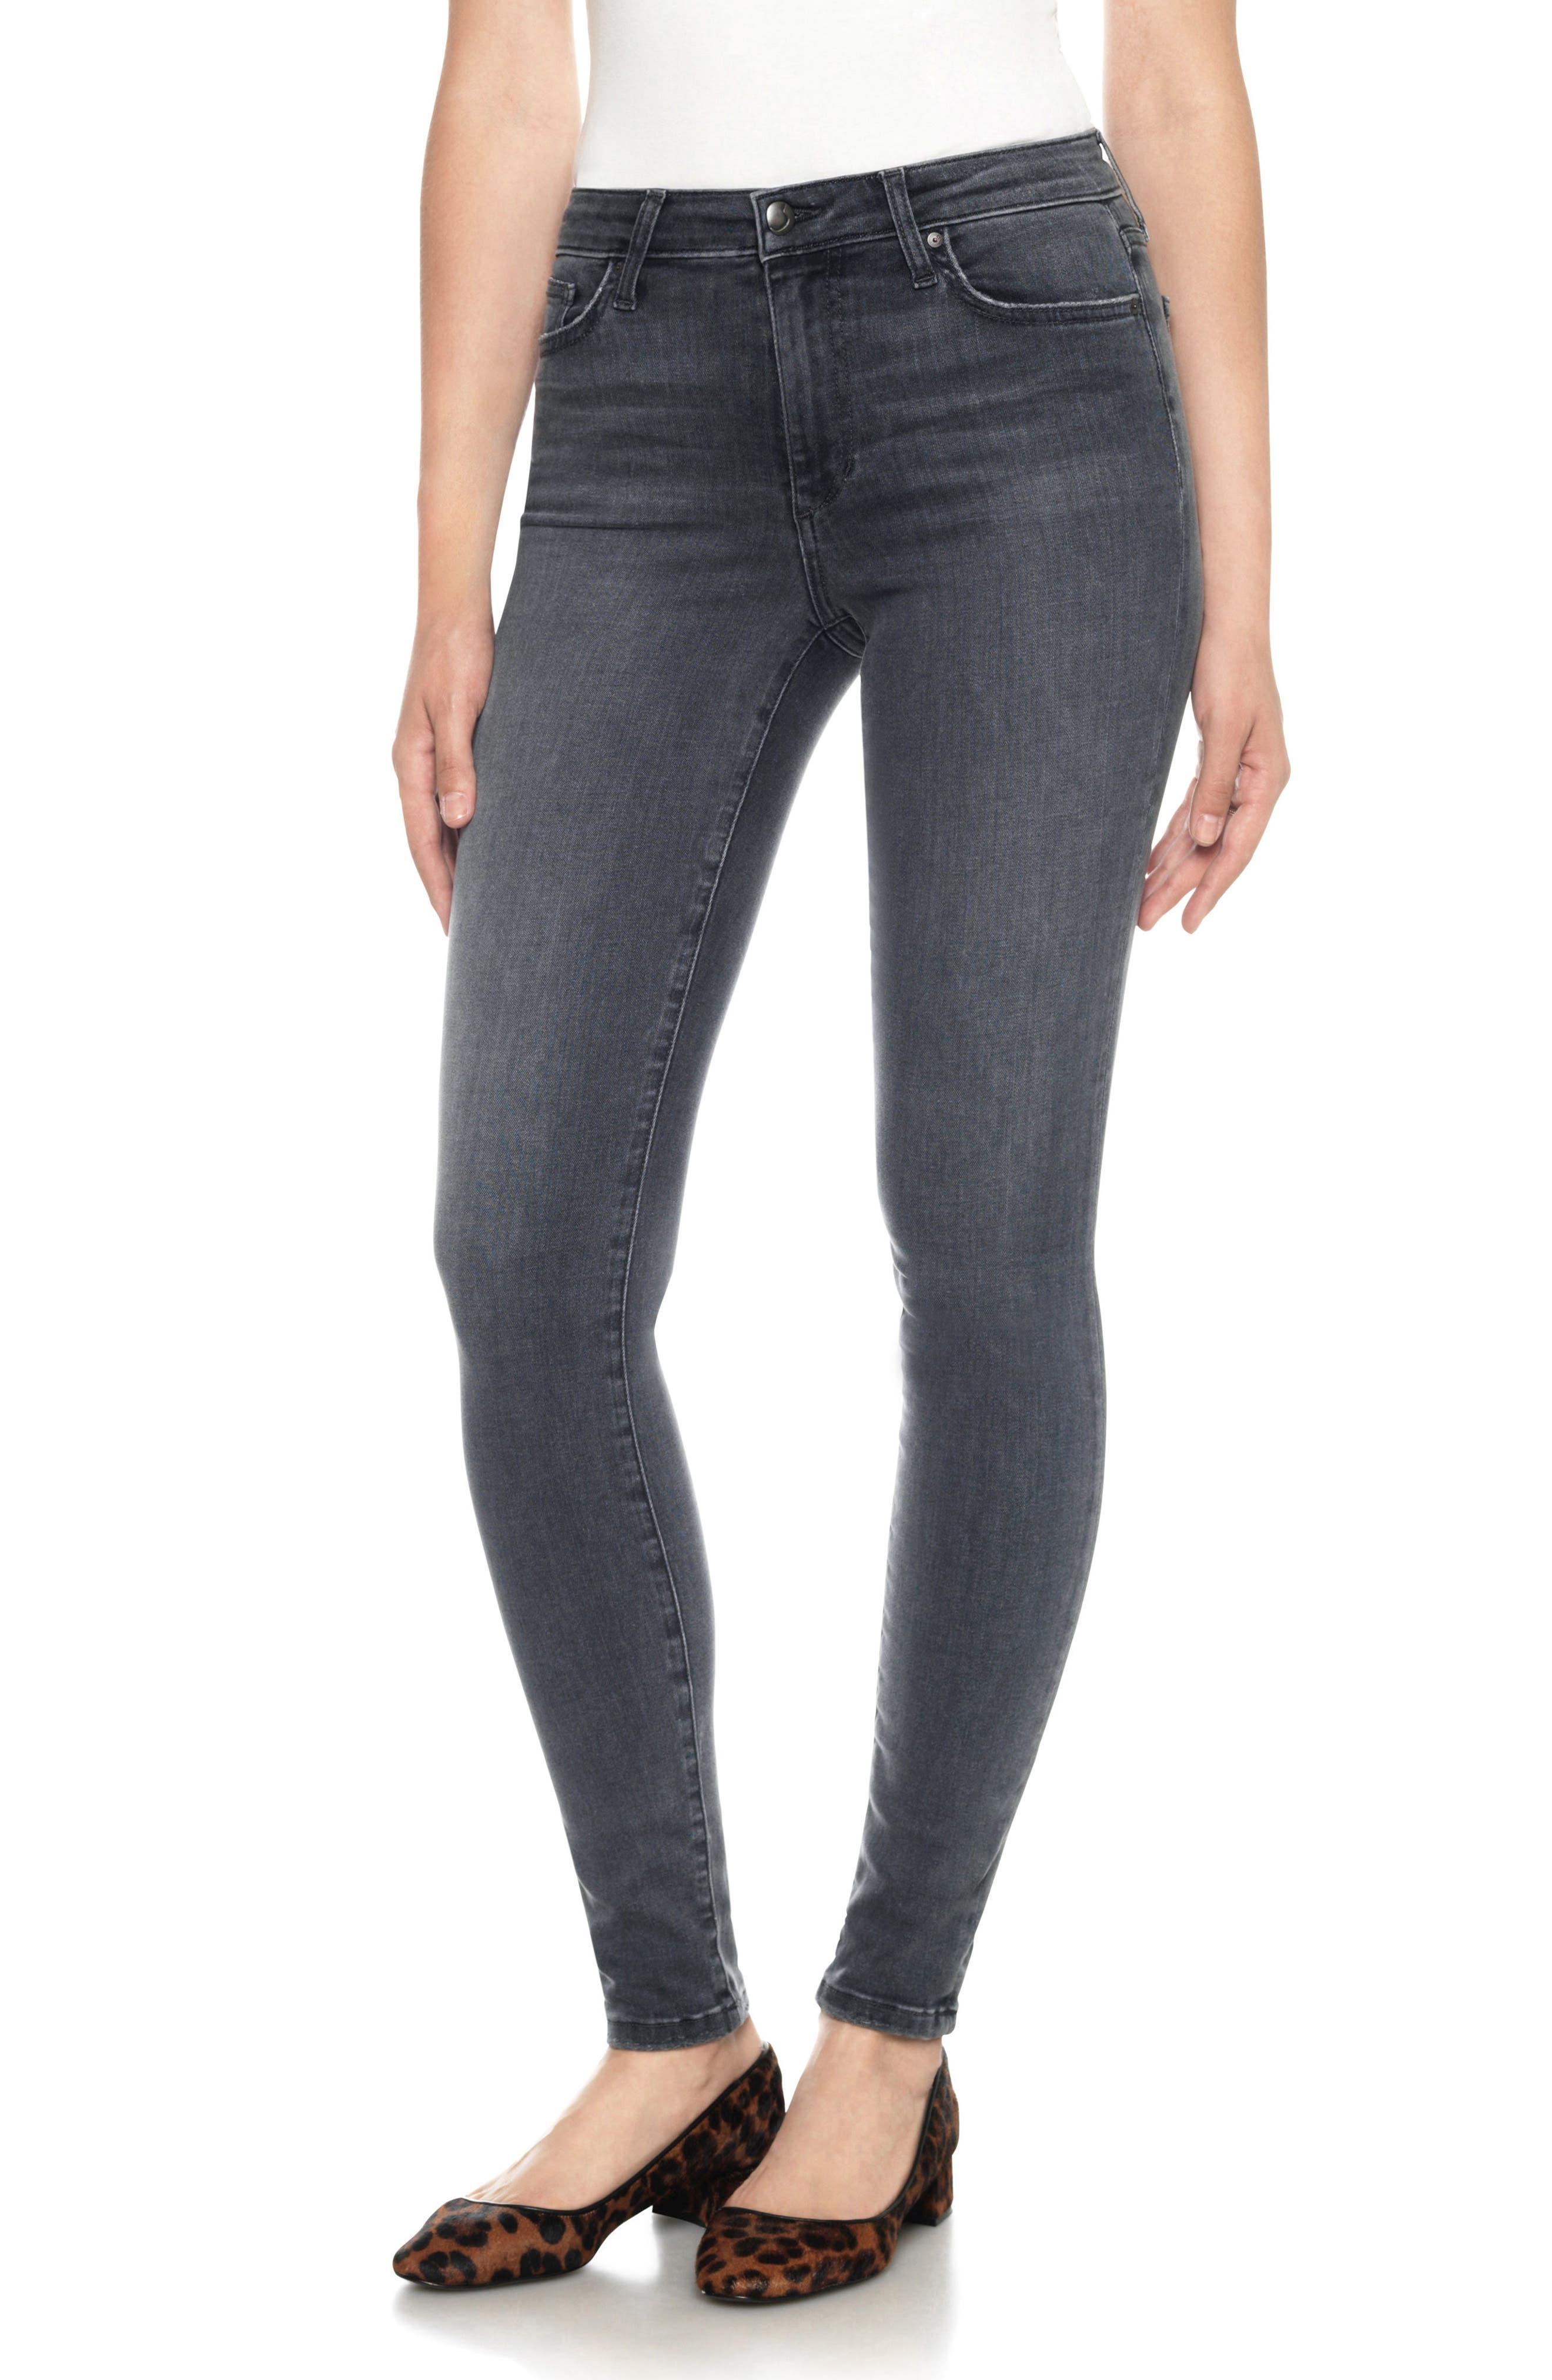 Alternate Image 1 Selected - Joe's Flawless - Charlie High Waist Skinny Jeans (Callista)